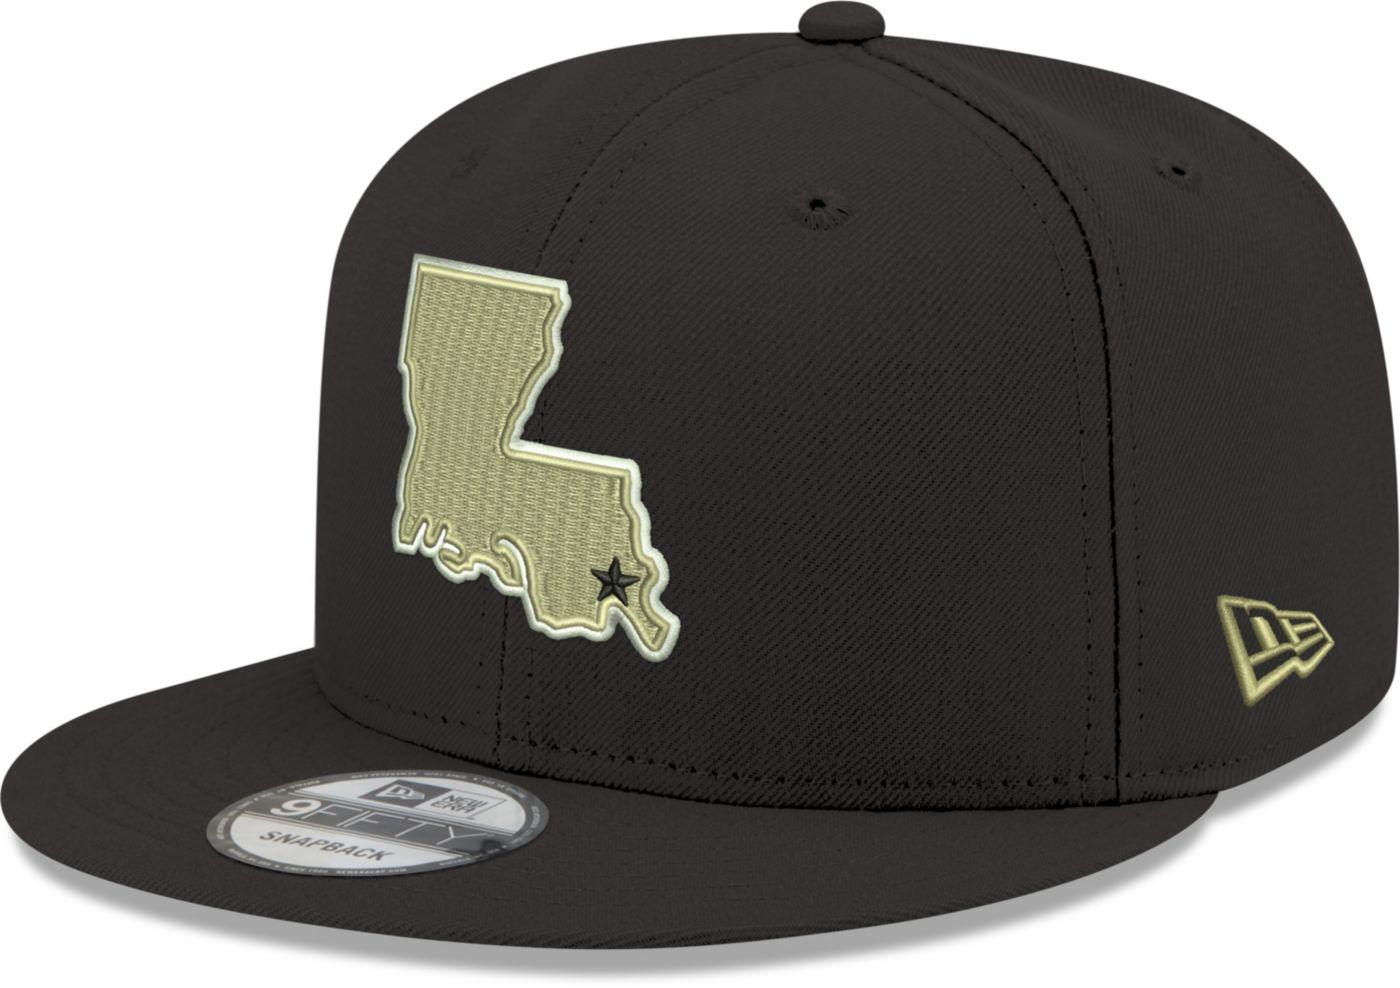 New Era Men's New Orleans Saints Elemental 9Fifty Adjustable Black Hat